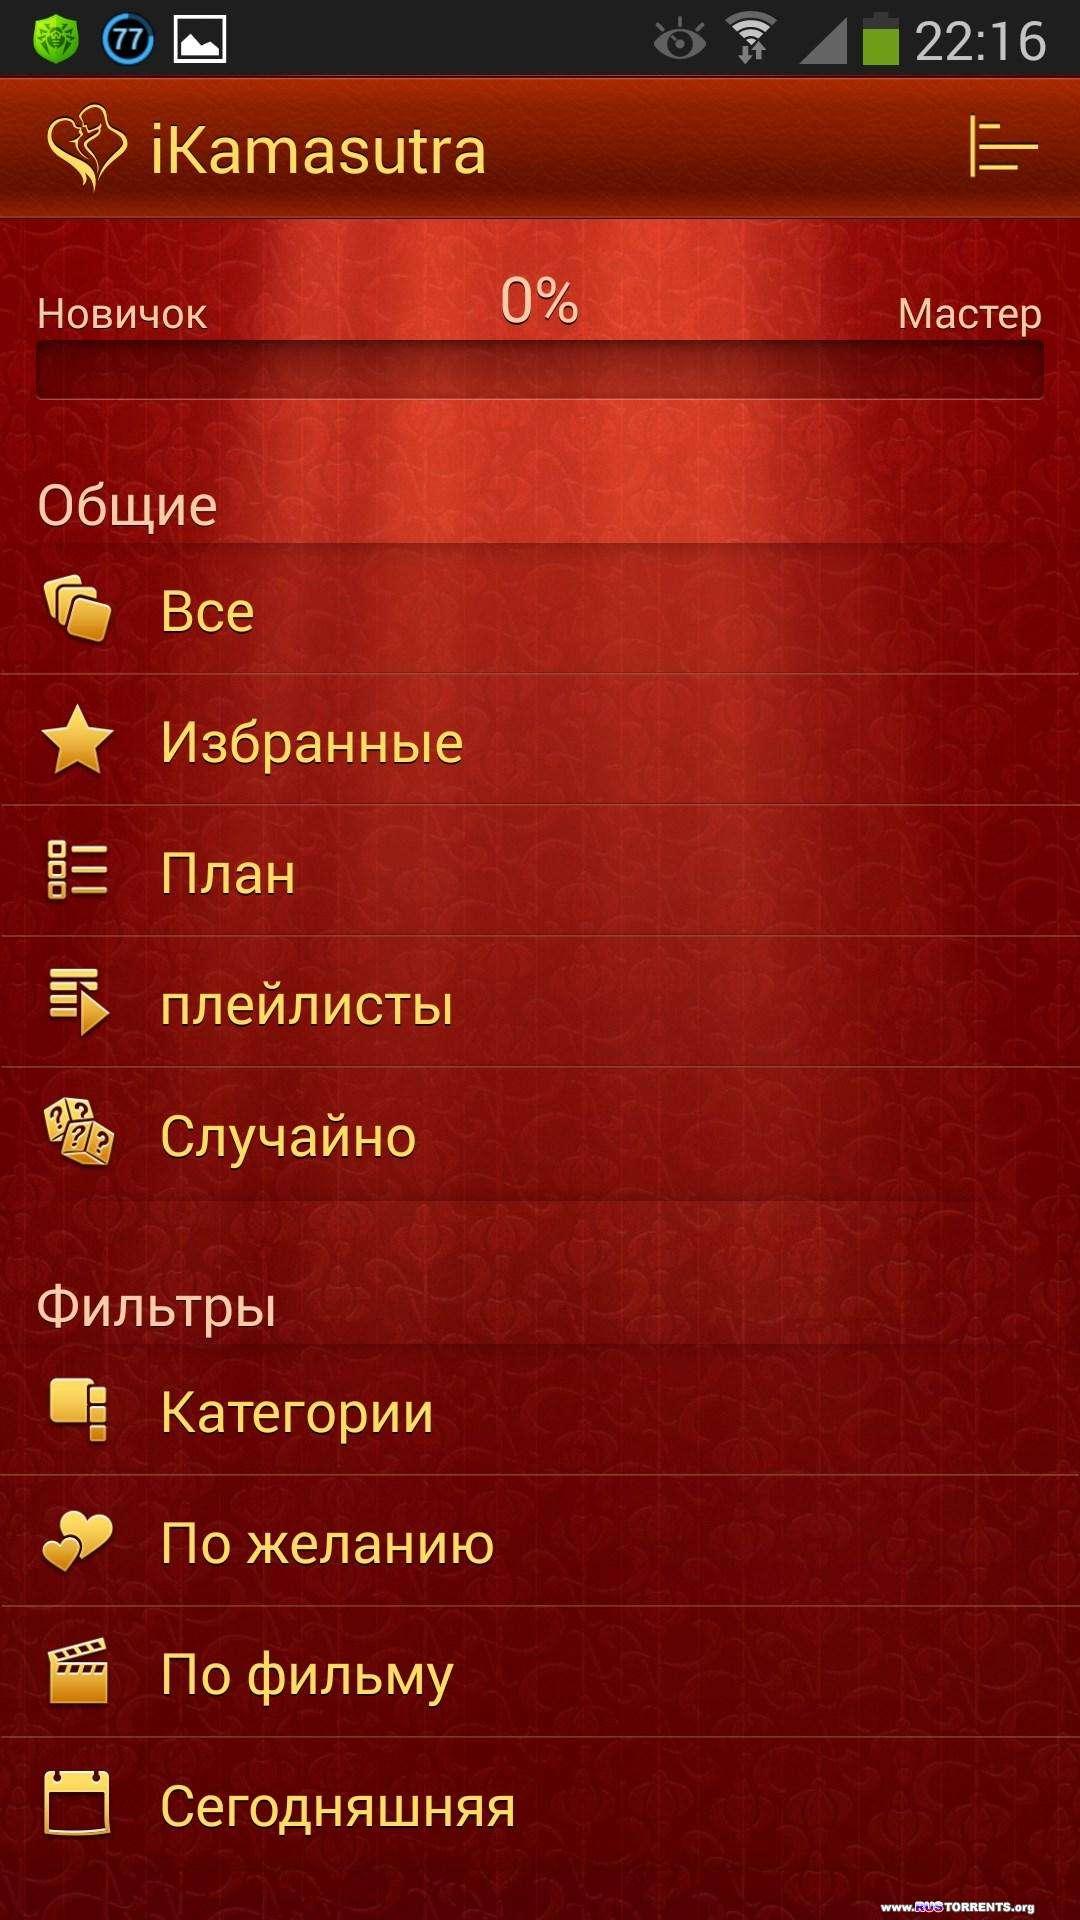 iKamasutra - позы для секса v 3.1.1 | Android